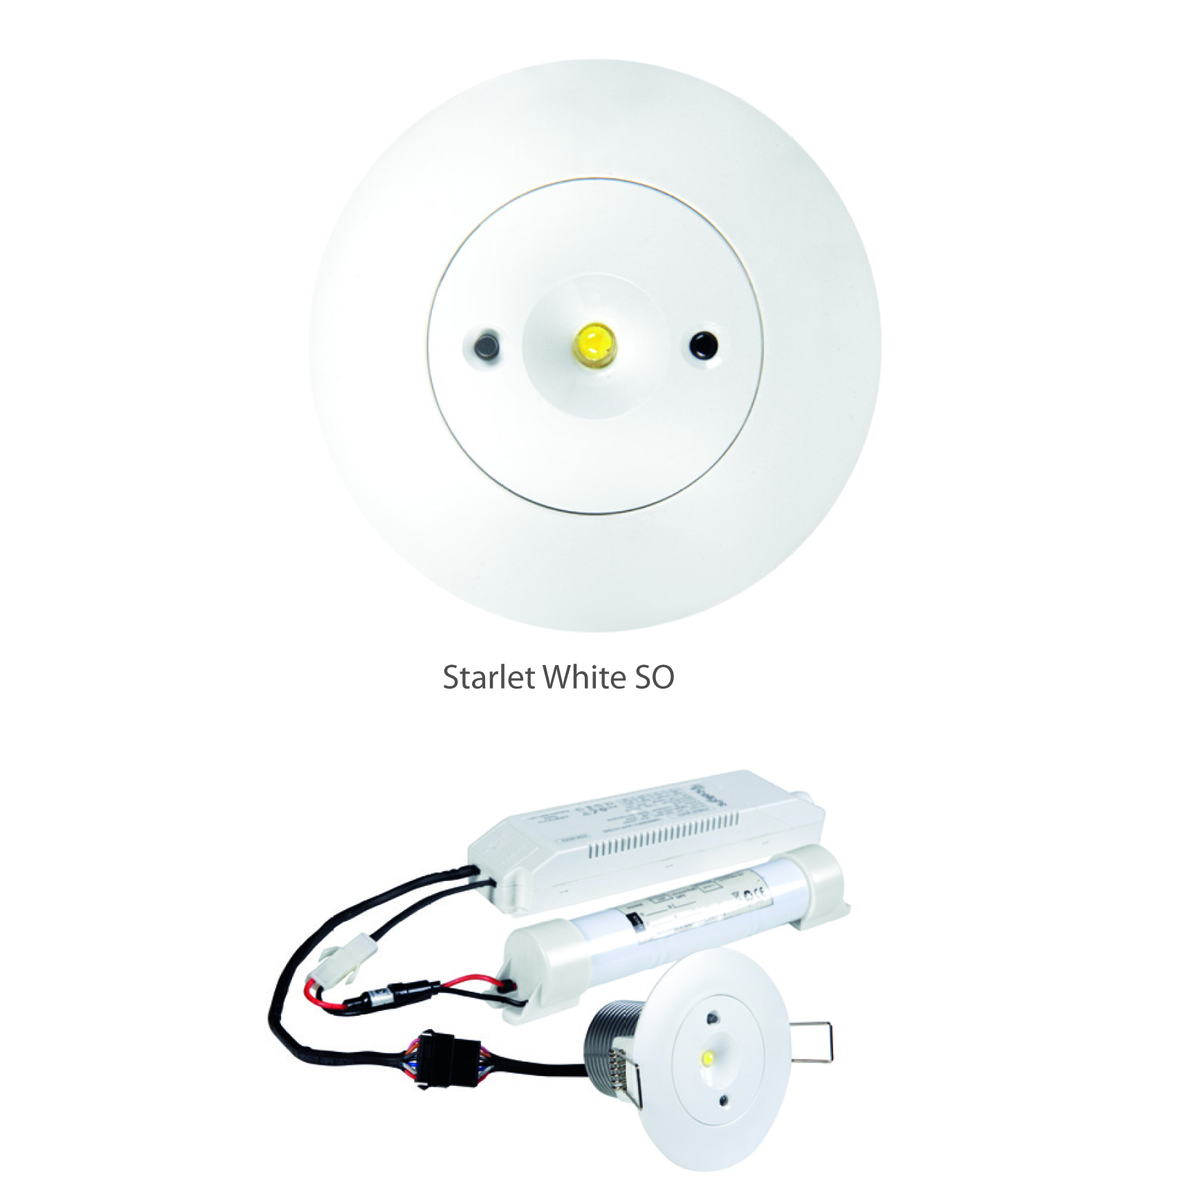 STARLET WHITE LED SO 5W A 3h AT (INLEWA 99614)